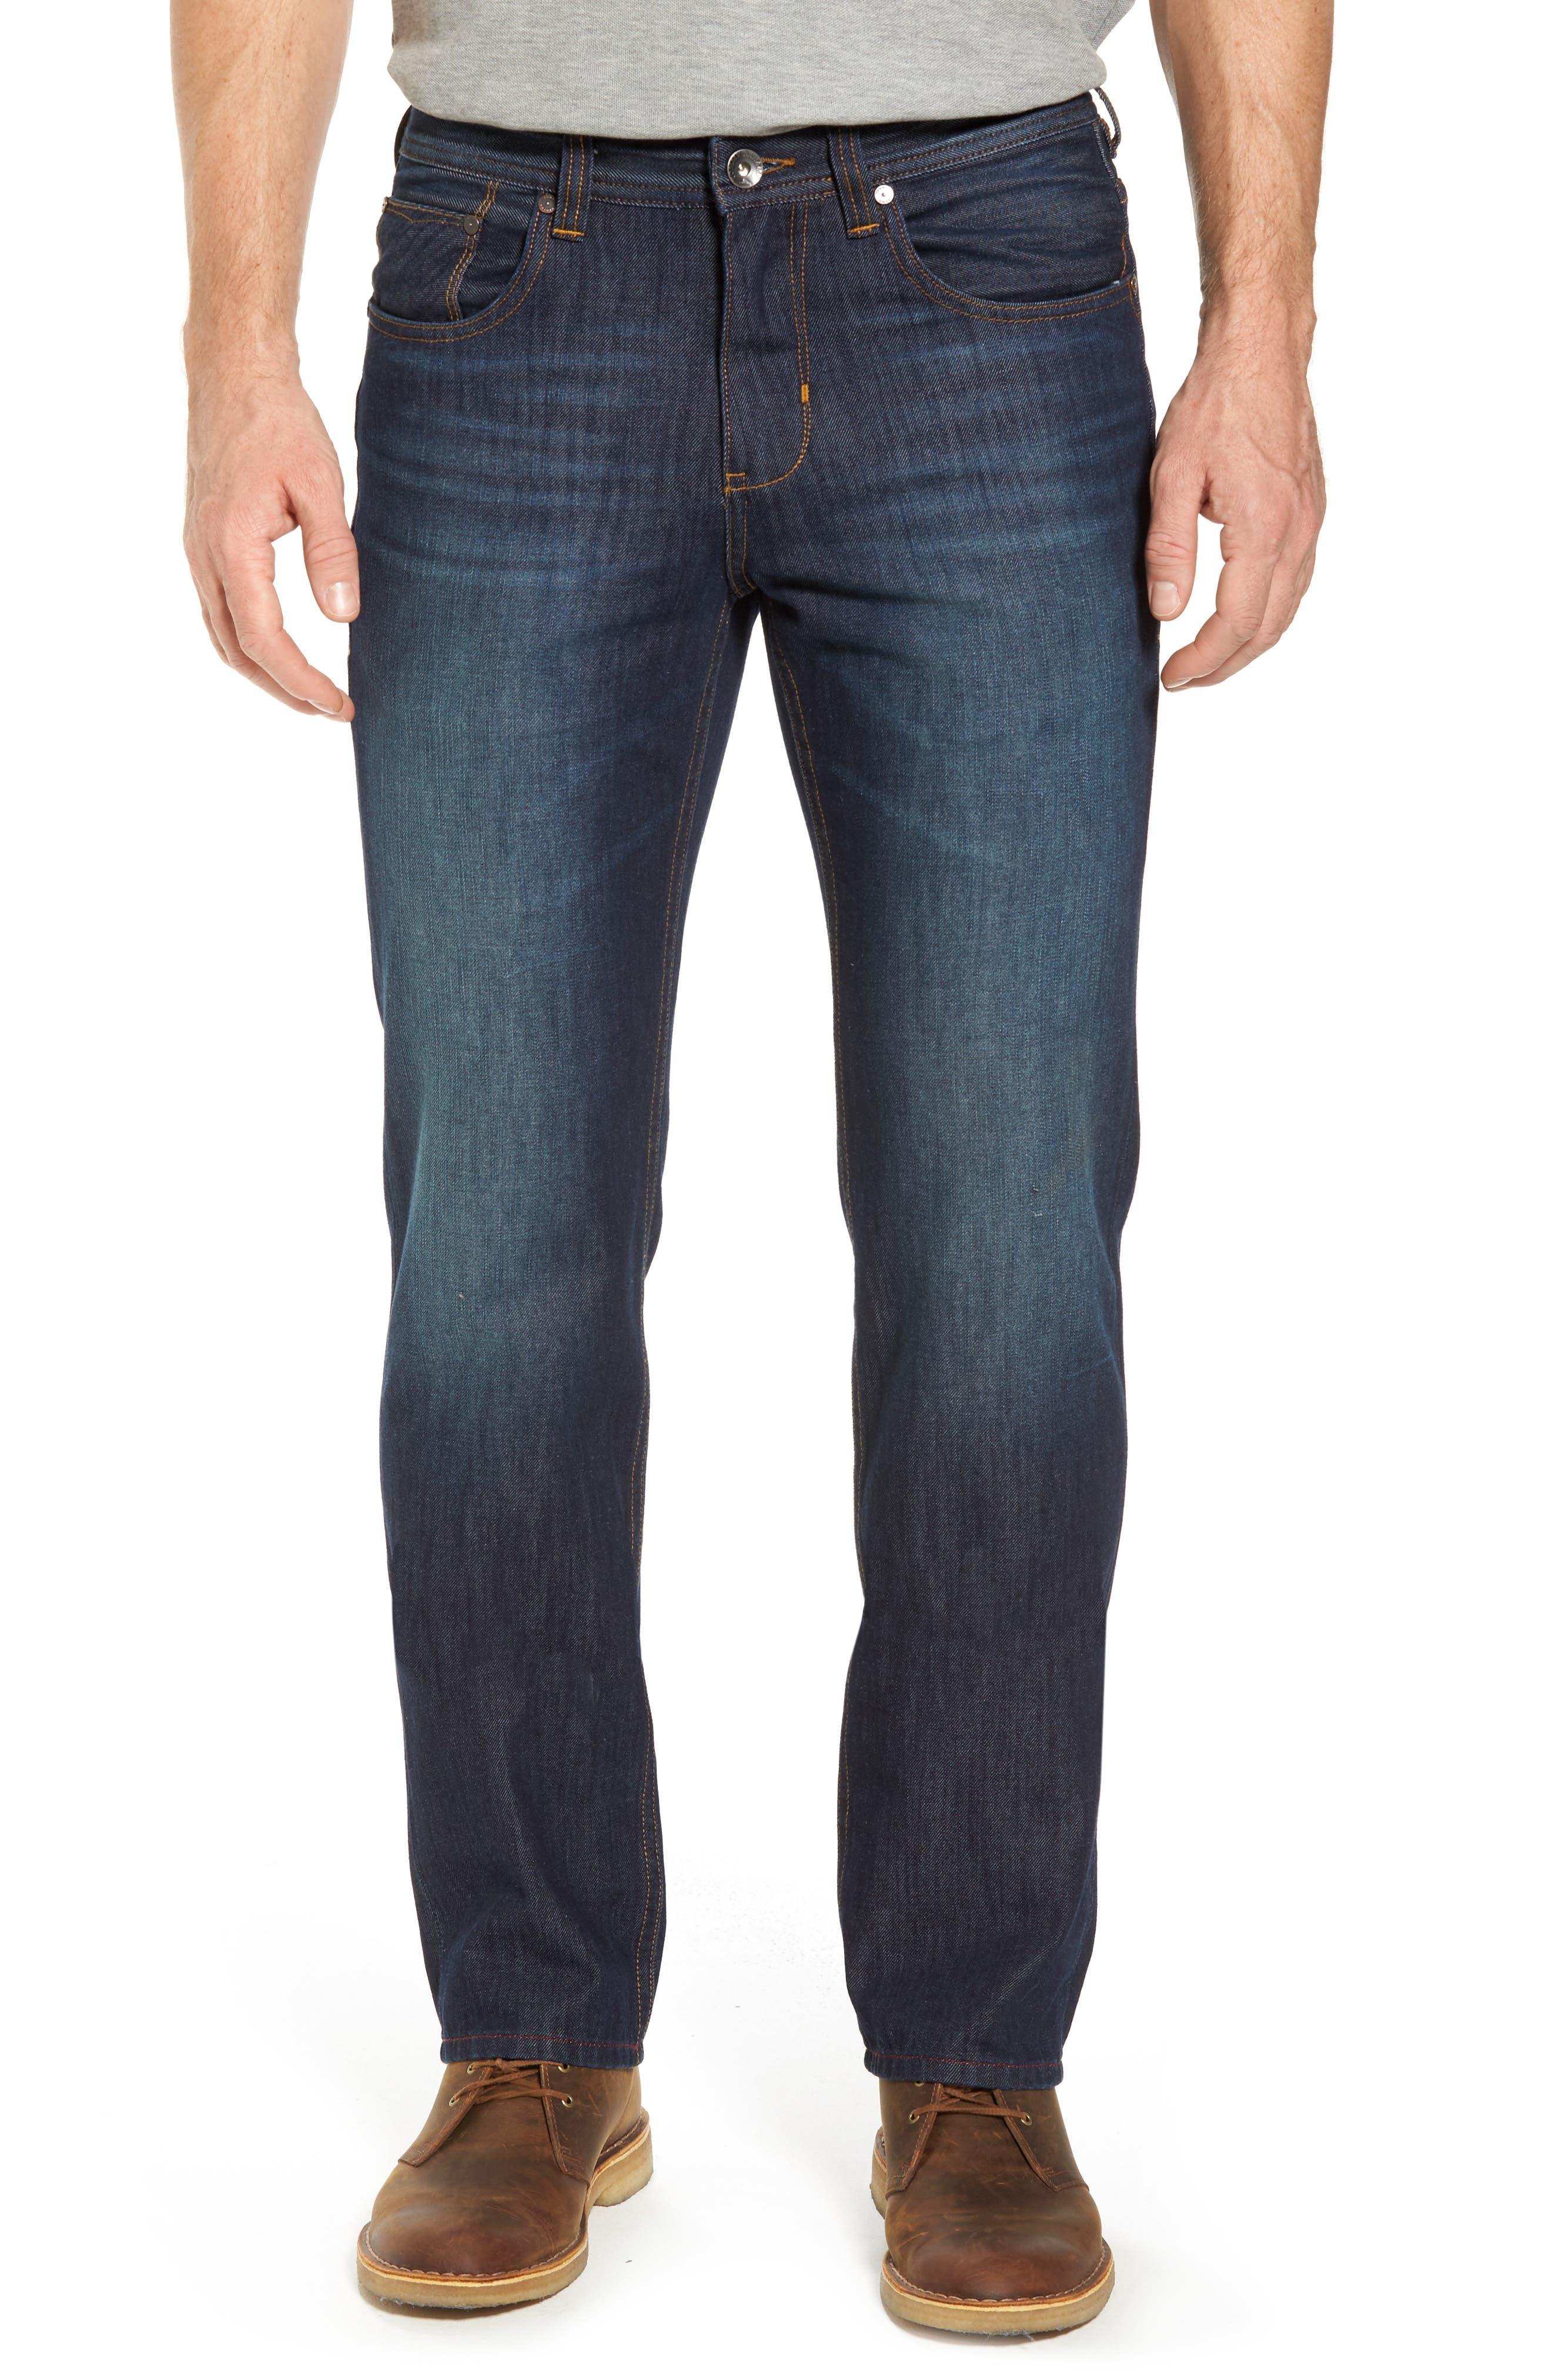 Bardabos Straight Leg Jeans,                         Main,                         color, Dark Indigo Wash